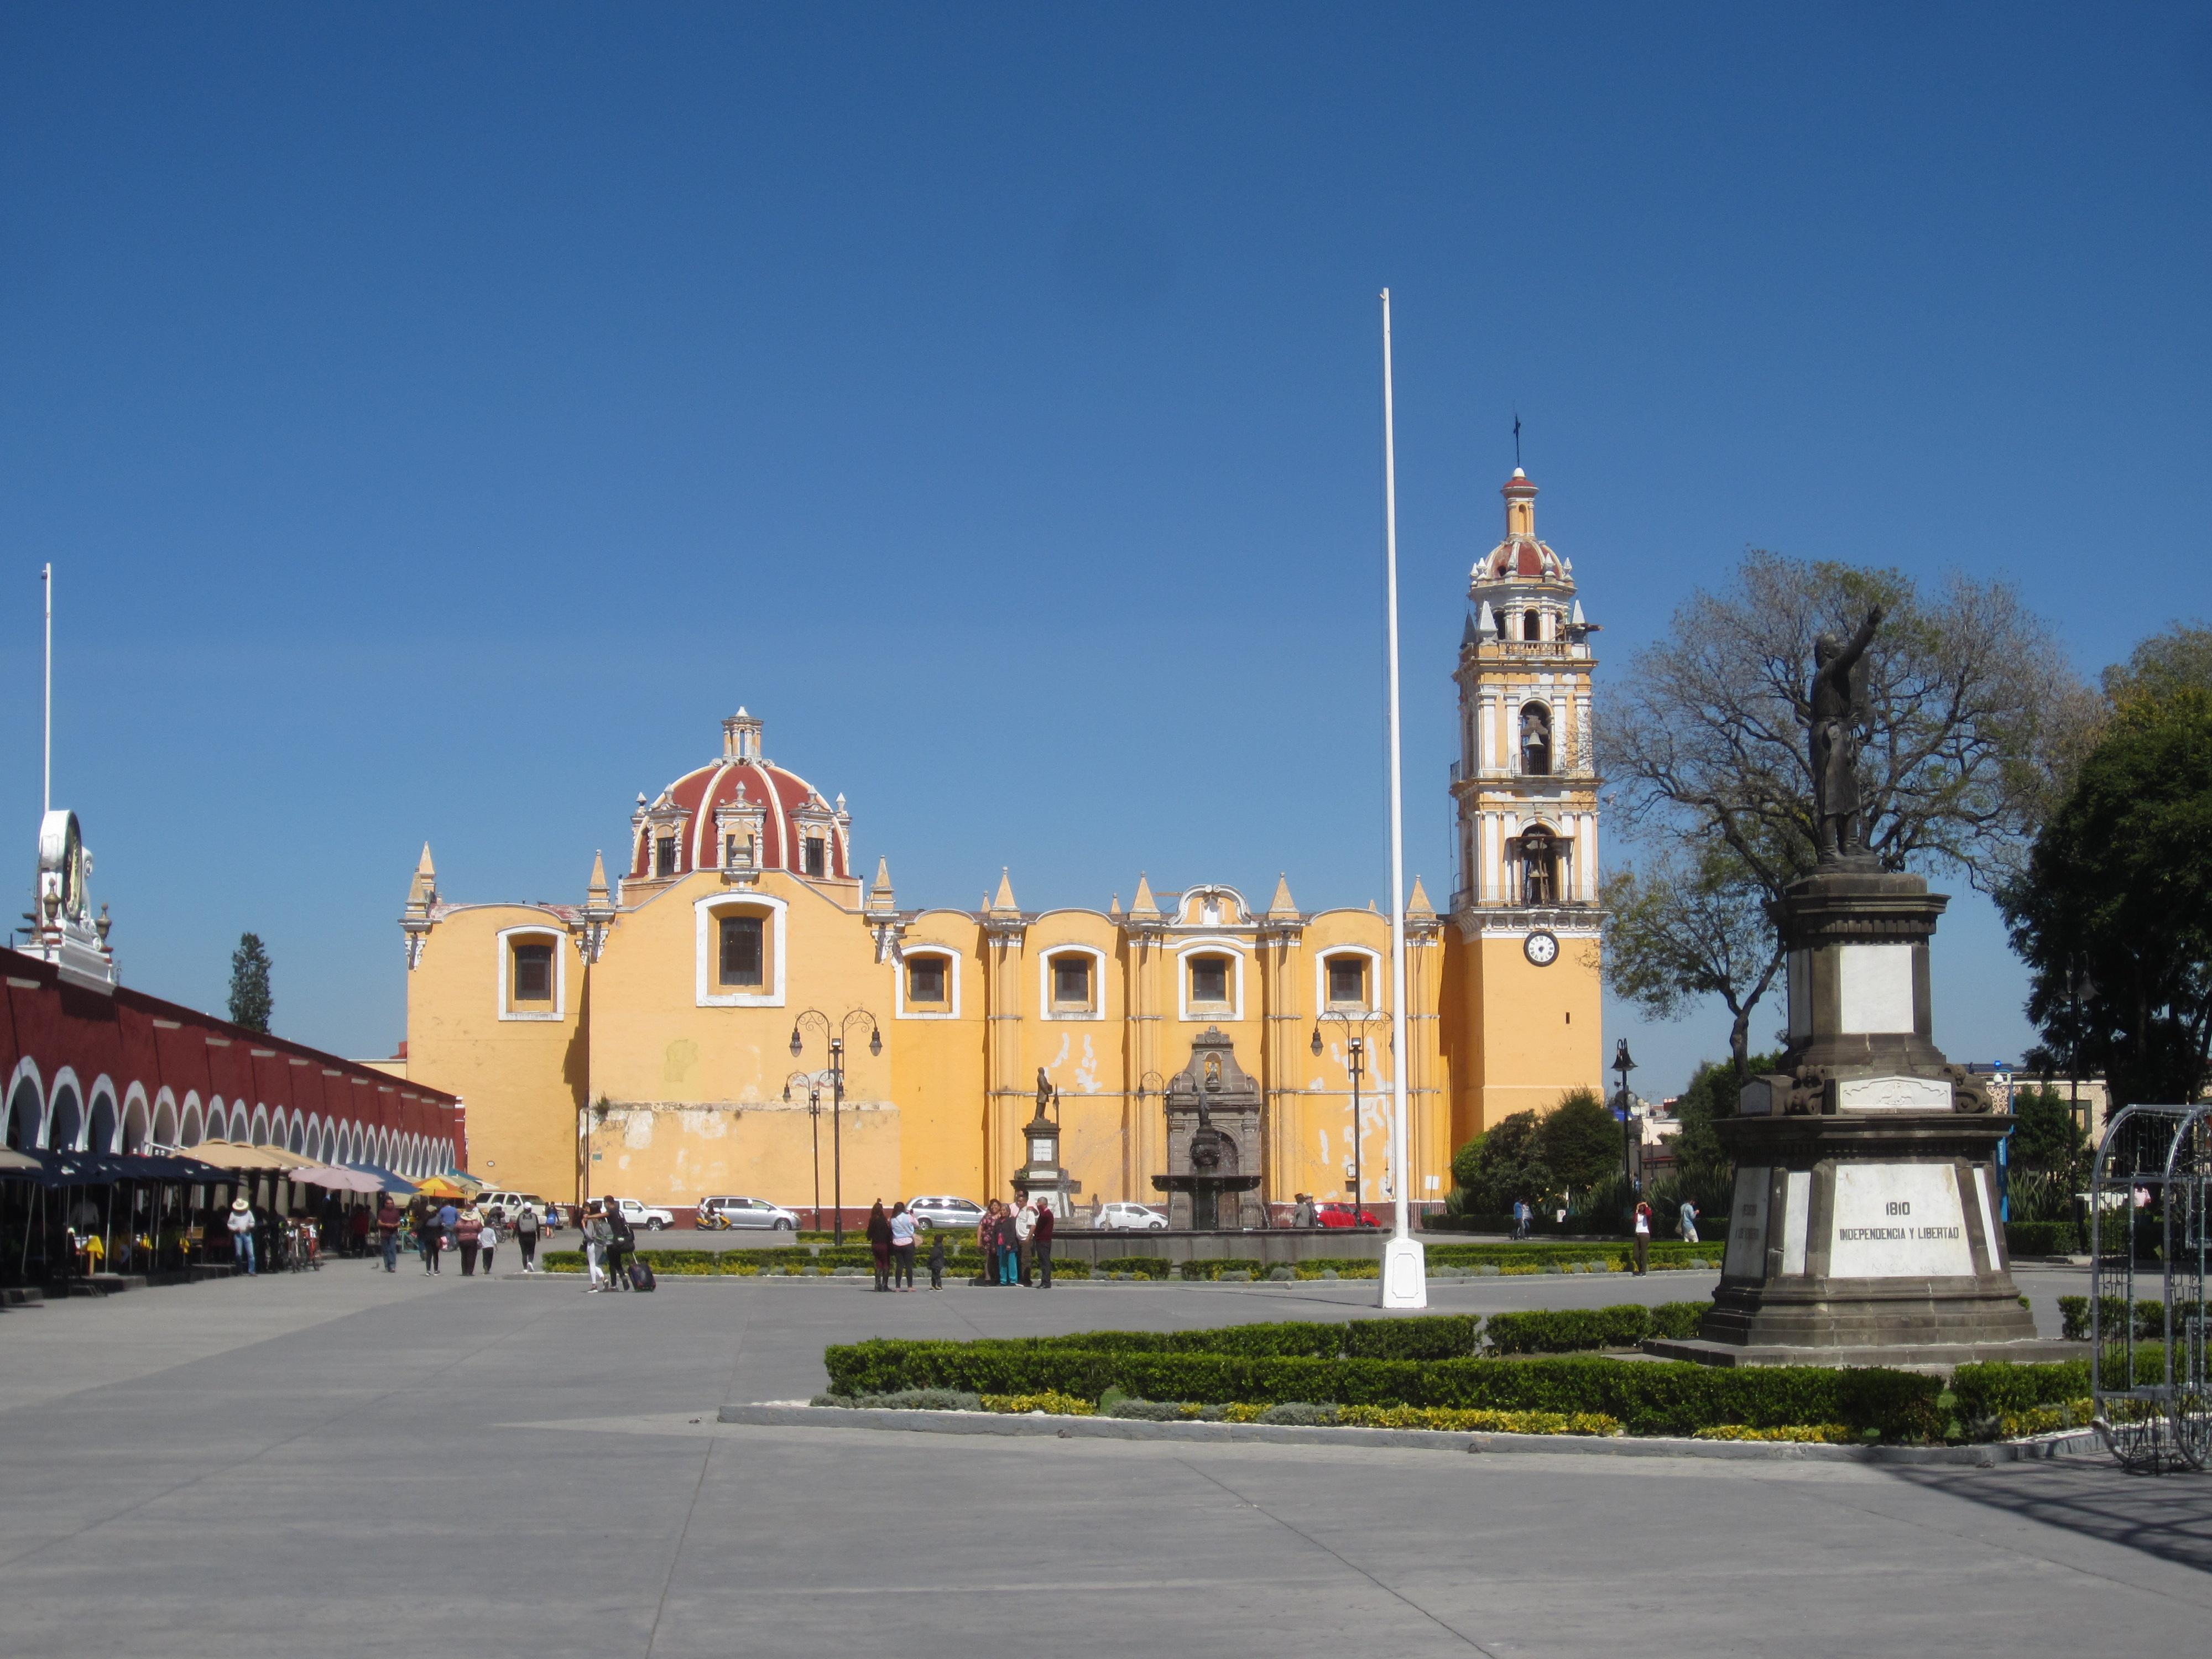 Plaza De La Concordia plaza de la concordia - wikipedia